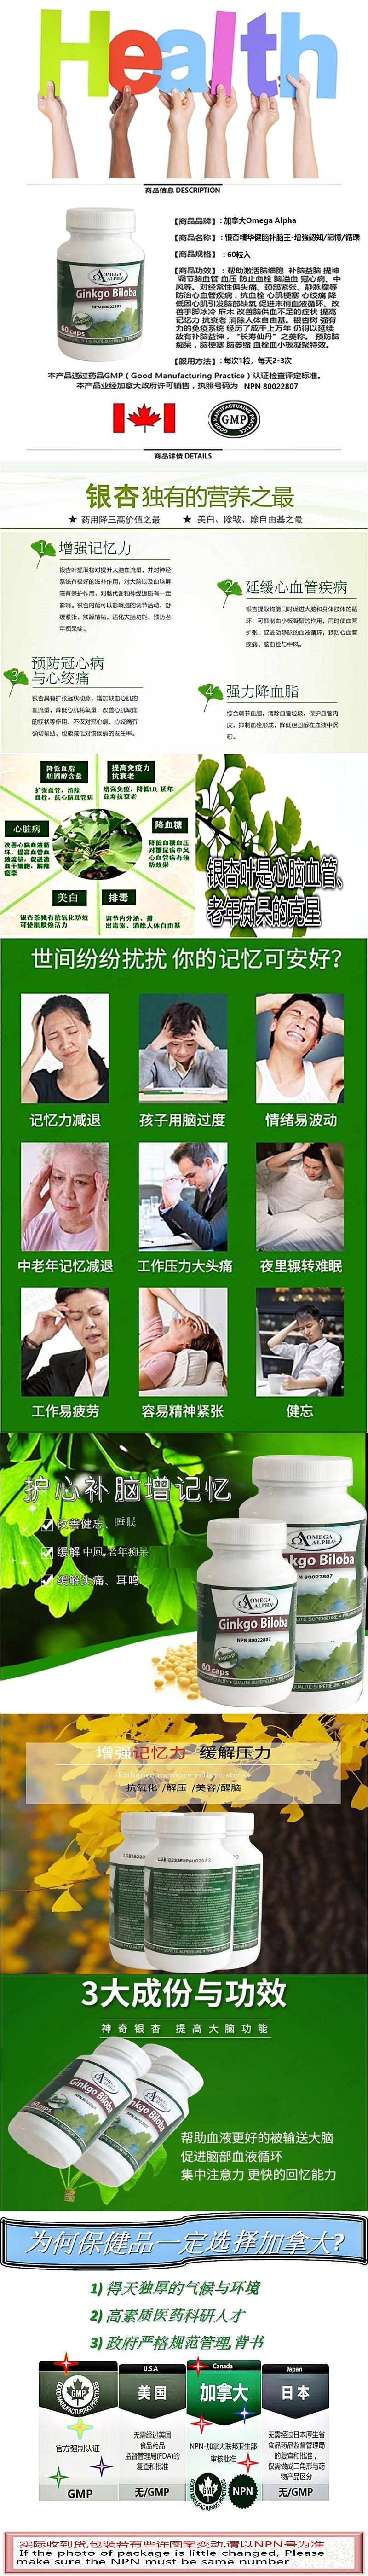 ecs014368n-vert.jpg